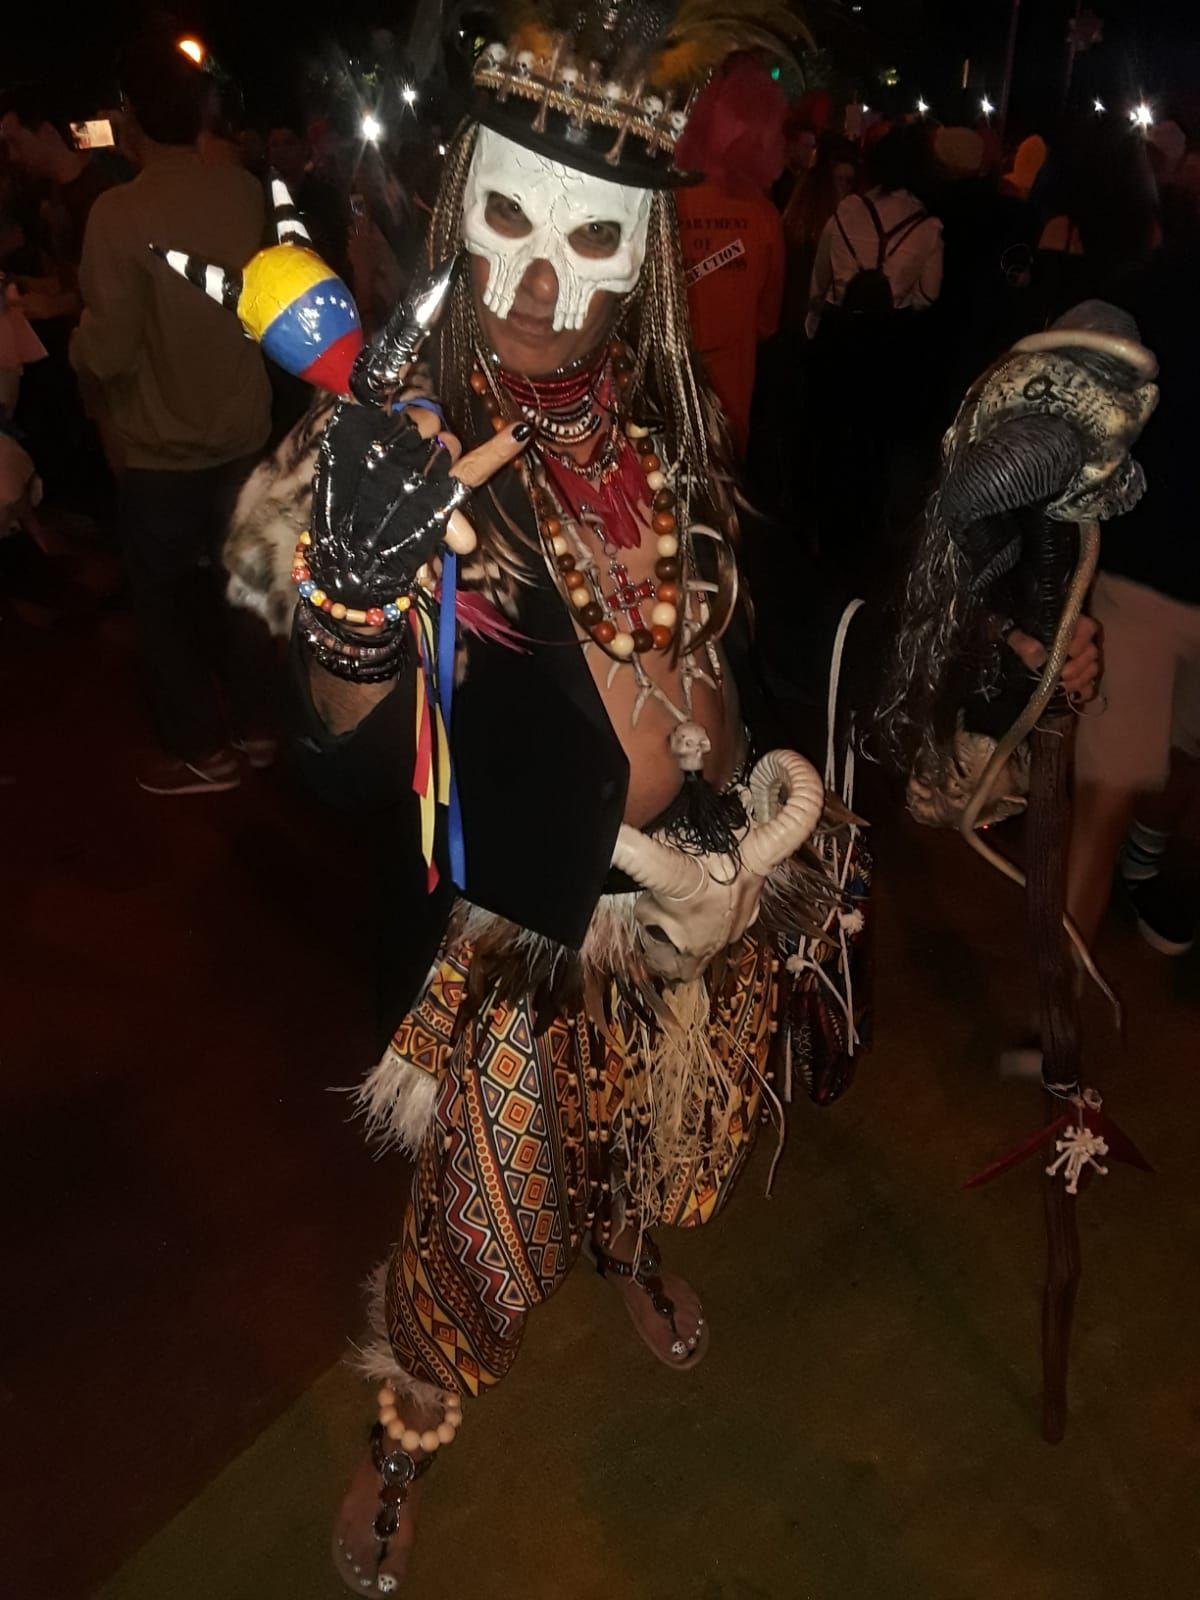 Voodoo Priest, Papa Legba, Witch Doctor, Halloween.